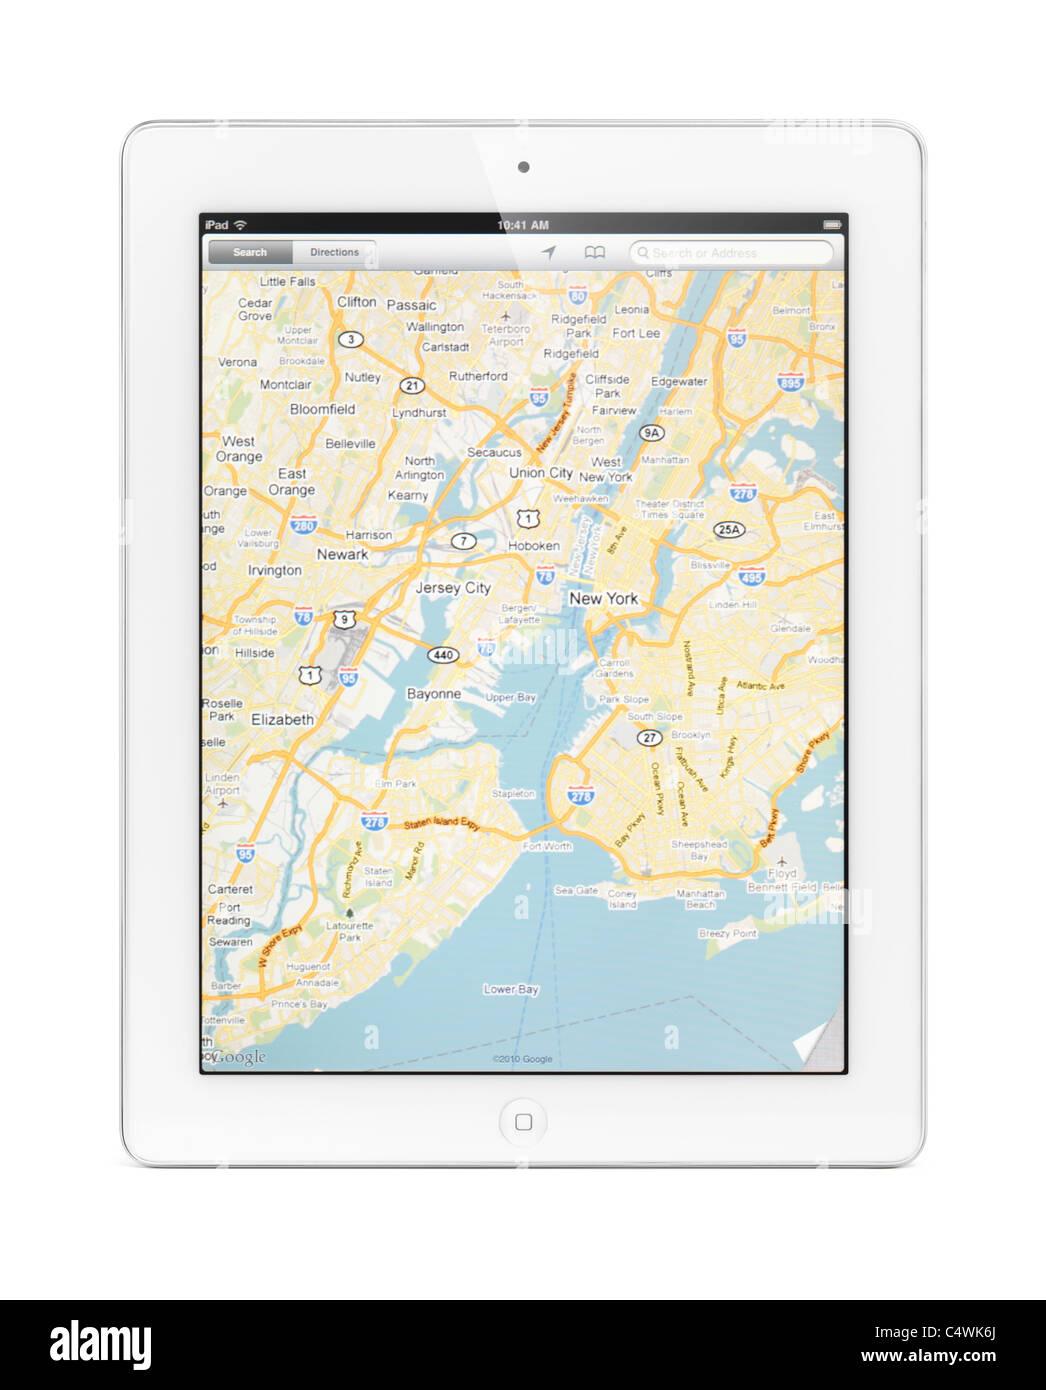 Google Map Of New York.Apple Ipad 2 Tablet Computer With A Map Of New York By Google Maps